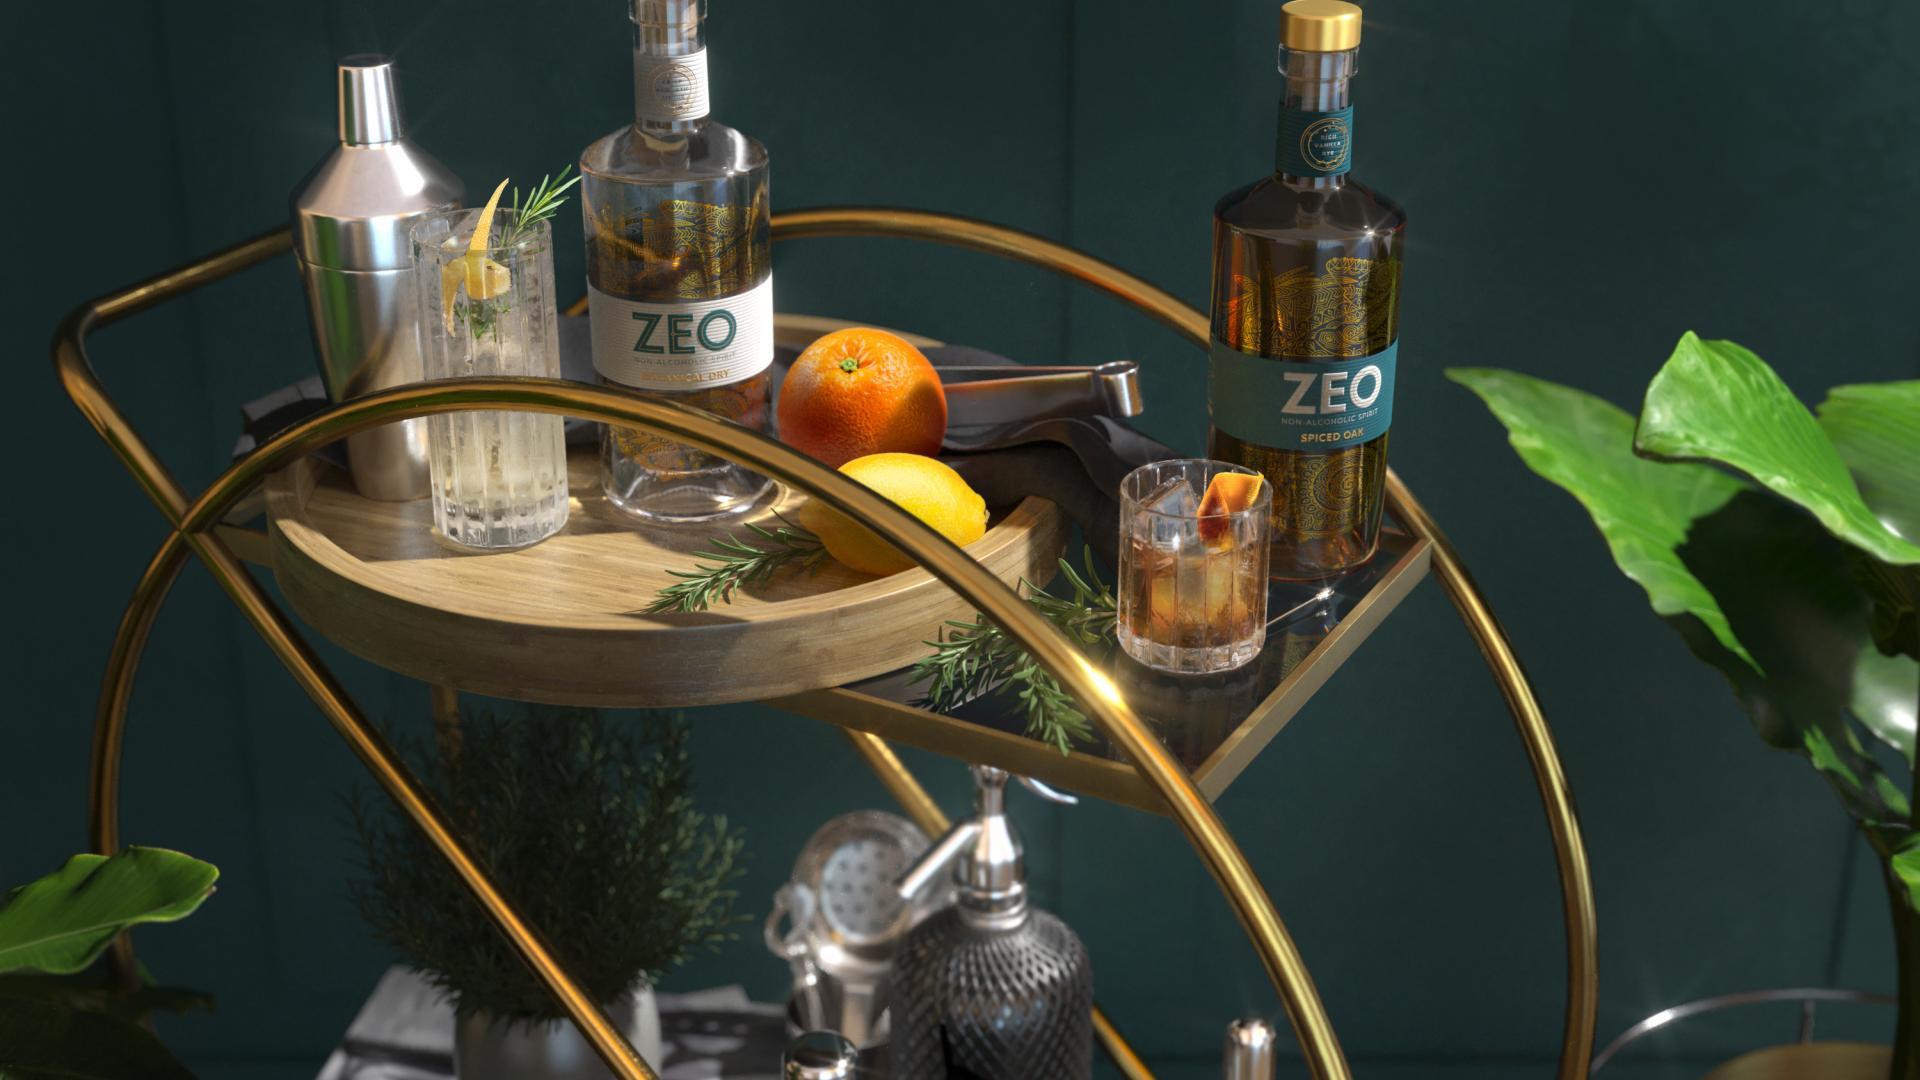 Non-alcoholic spirits: ZEO